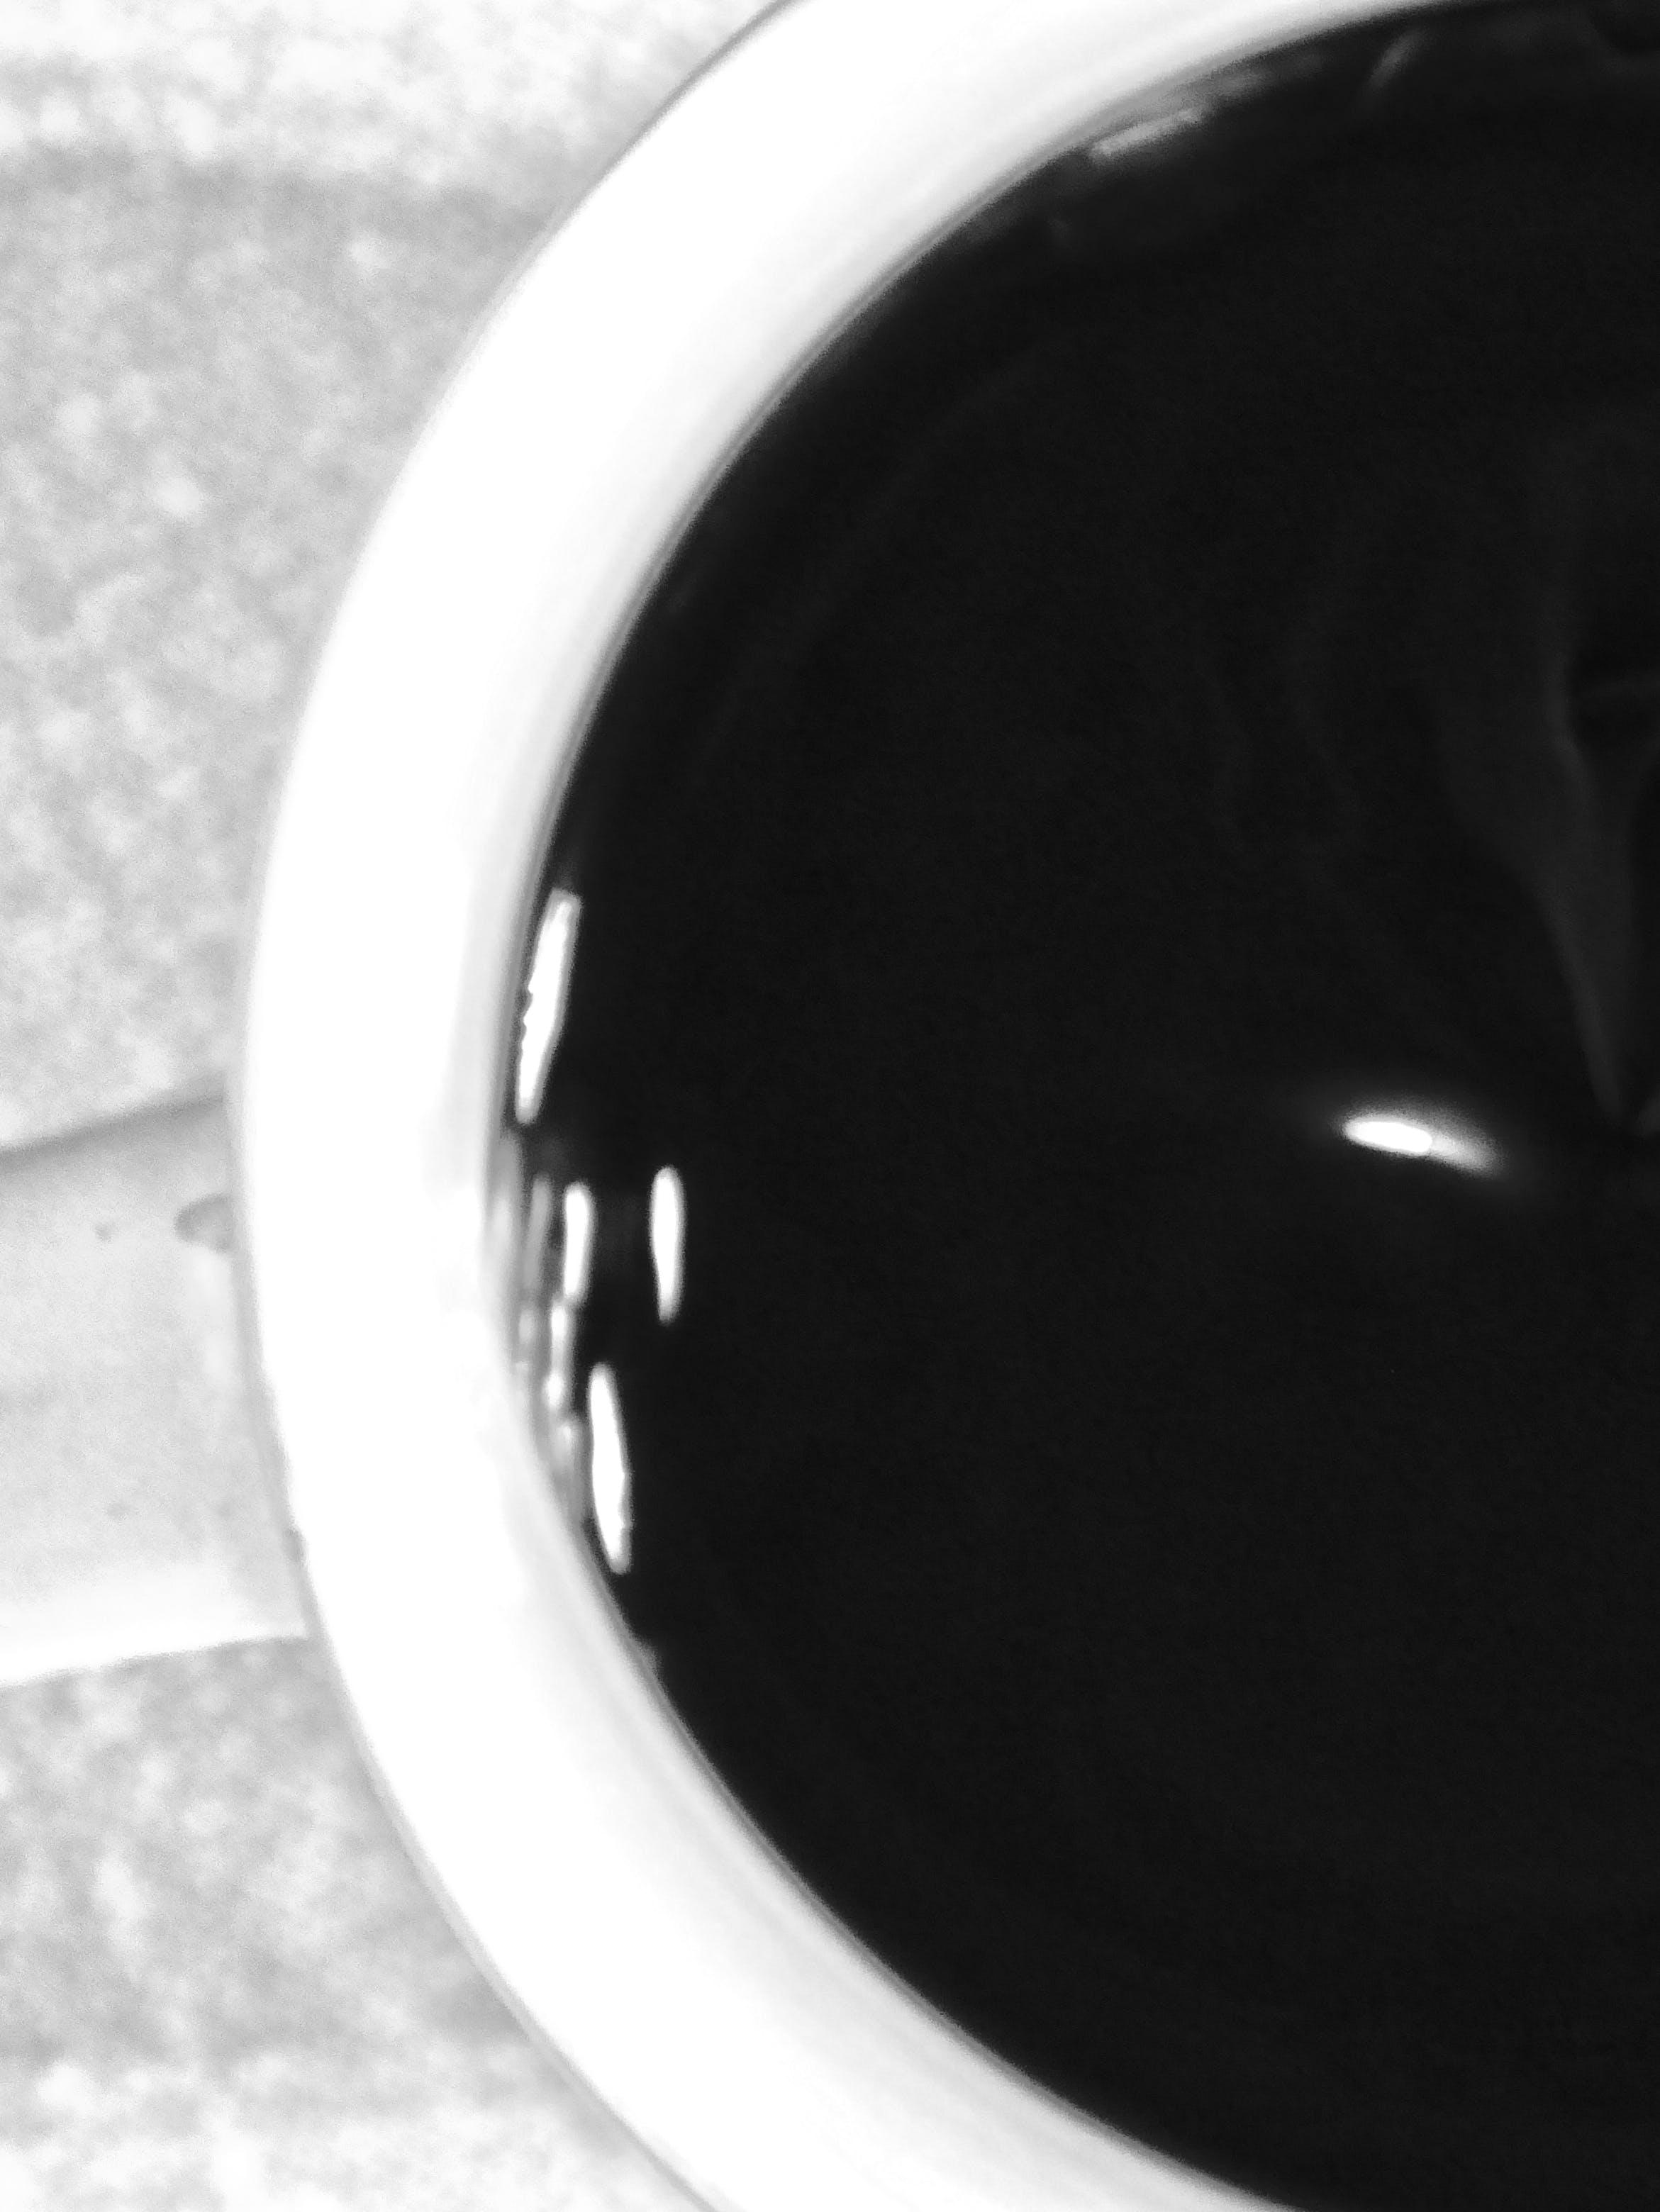 Free stock photo of black and white, black coffee